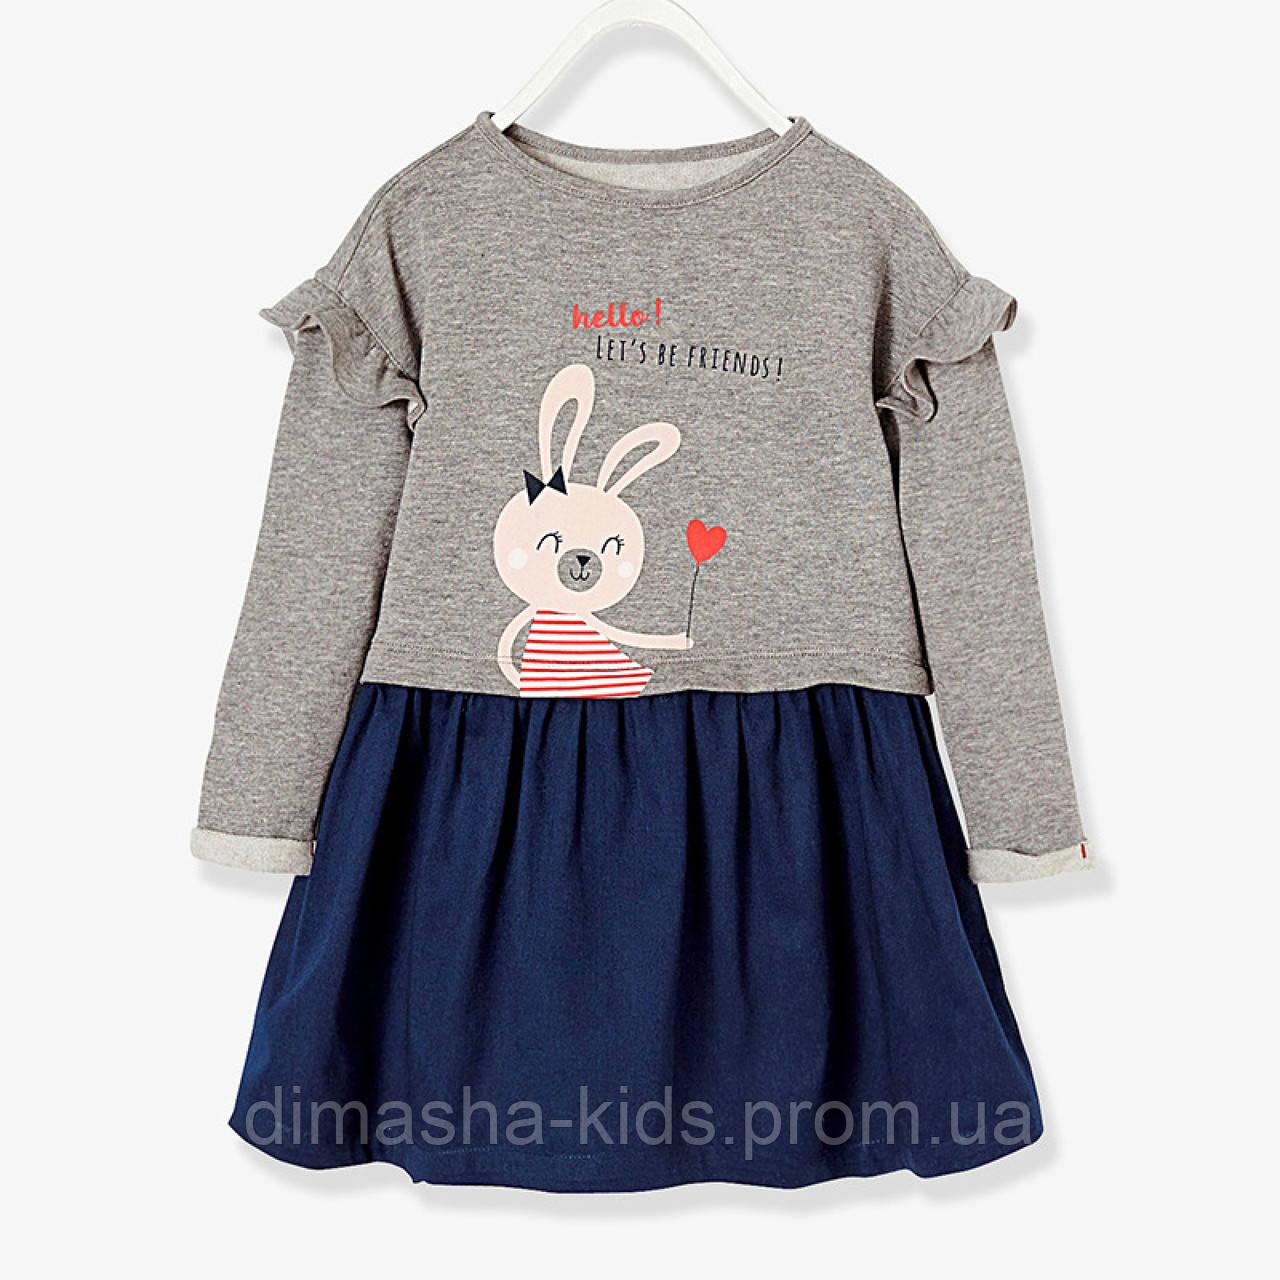 4ddb0c4fa13 Платье для девочки. Friends.  продажа